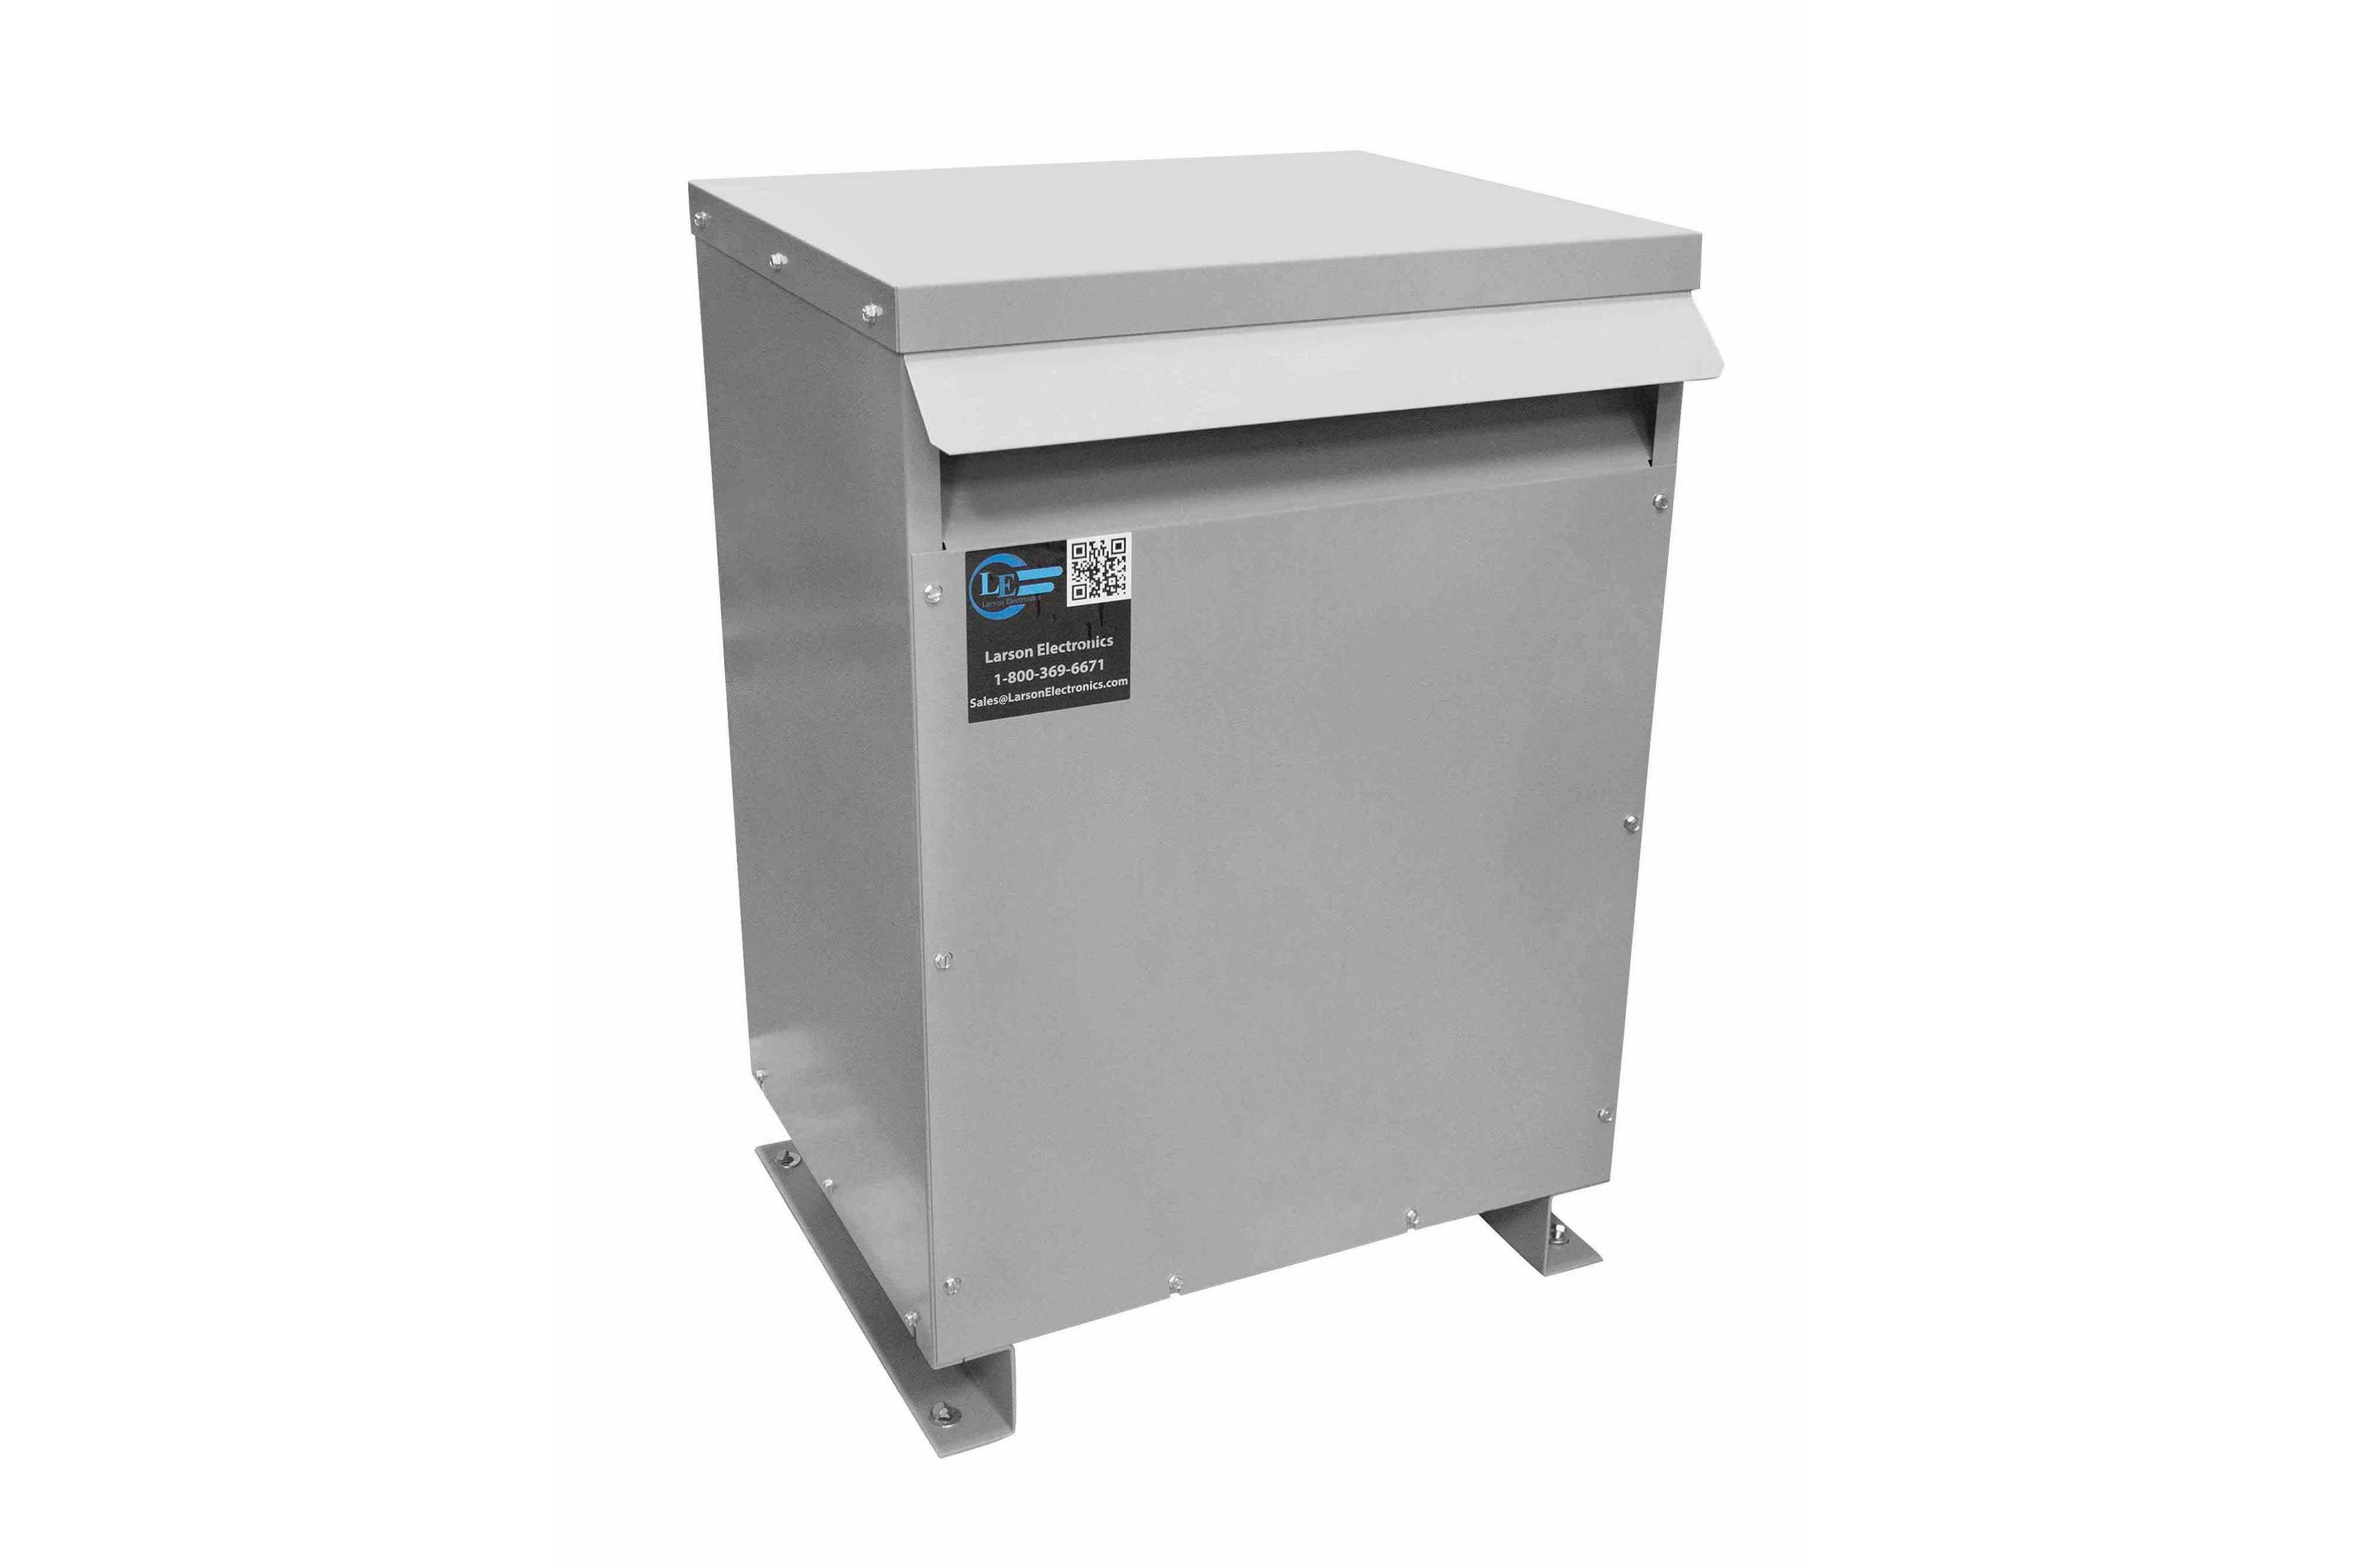 150 kVA 3PH Isolation Transformer, 600V Wye Primary, 415V Delta Secondary, N3R, Ventilated, 60 Hz